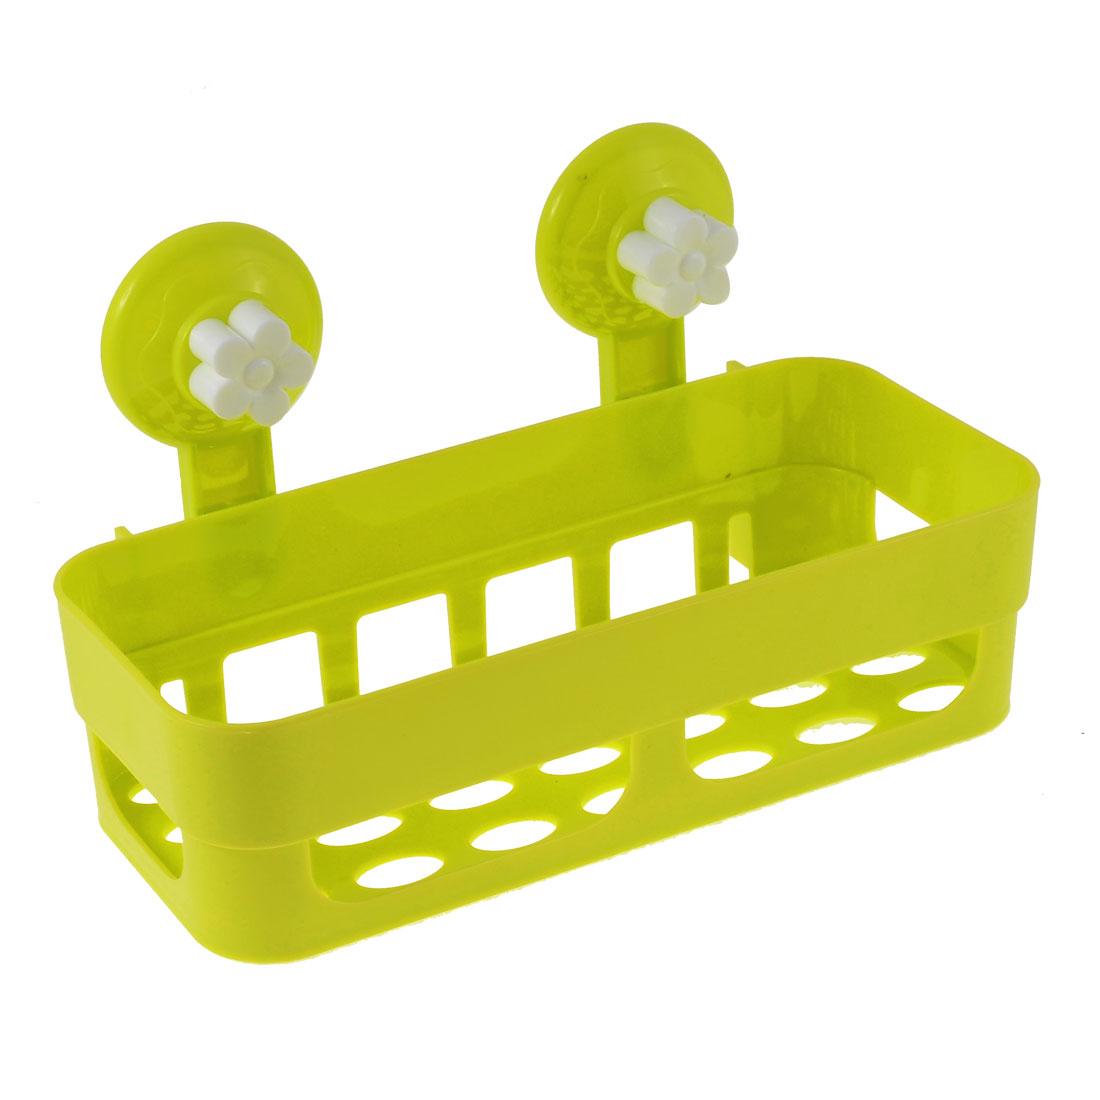 ABS Plastic Shelf Bathroom Toiletry Storage Holder Accessories Yellow Green White